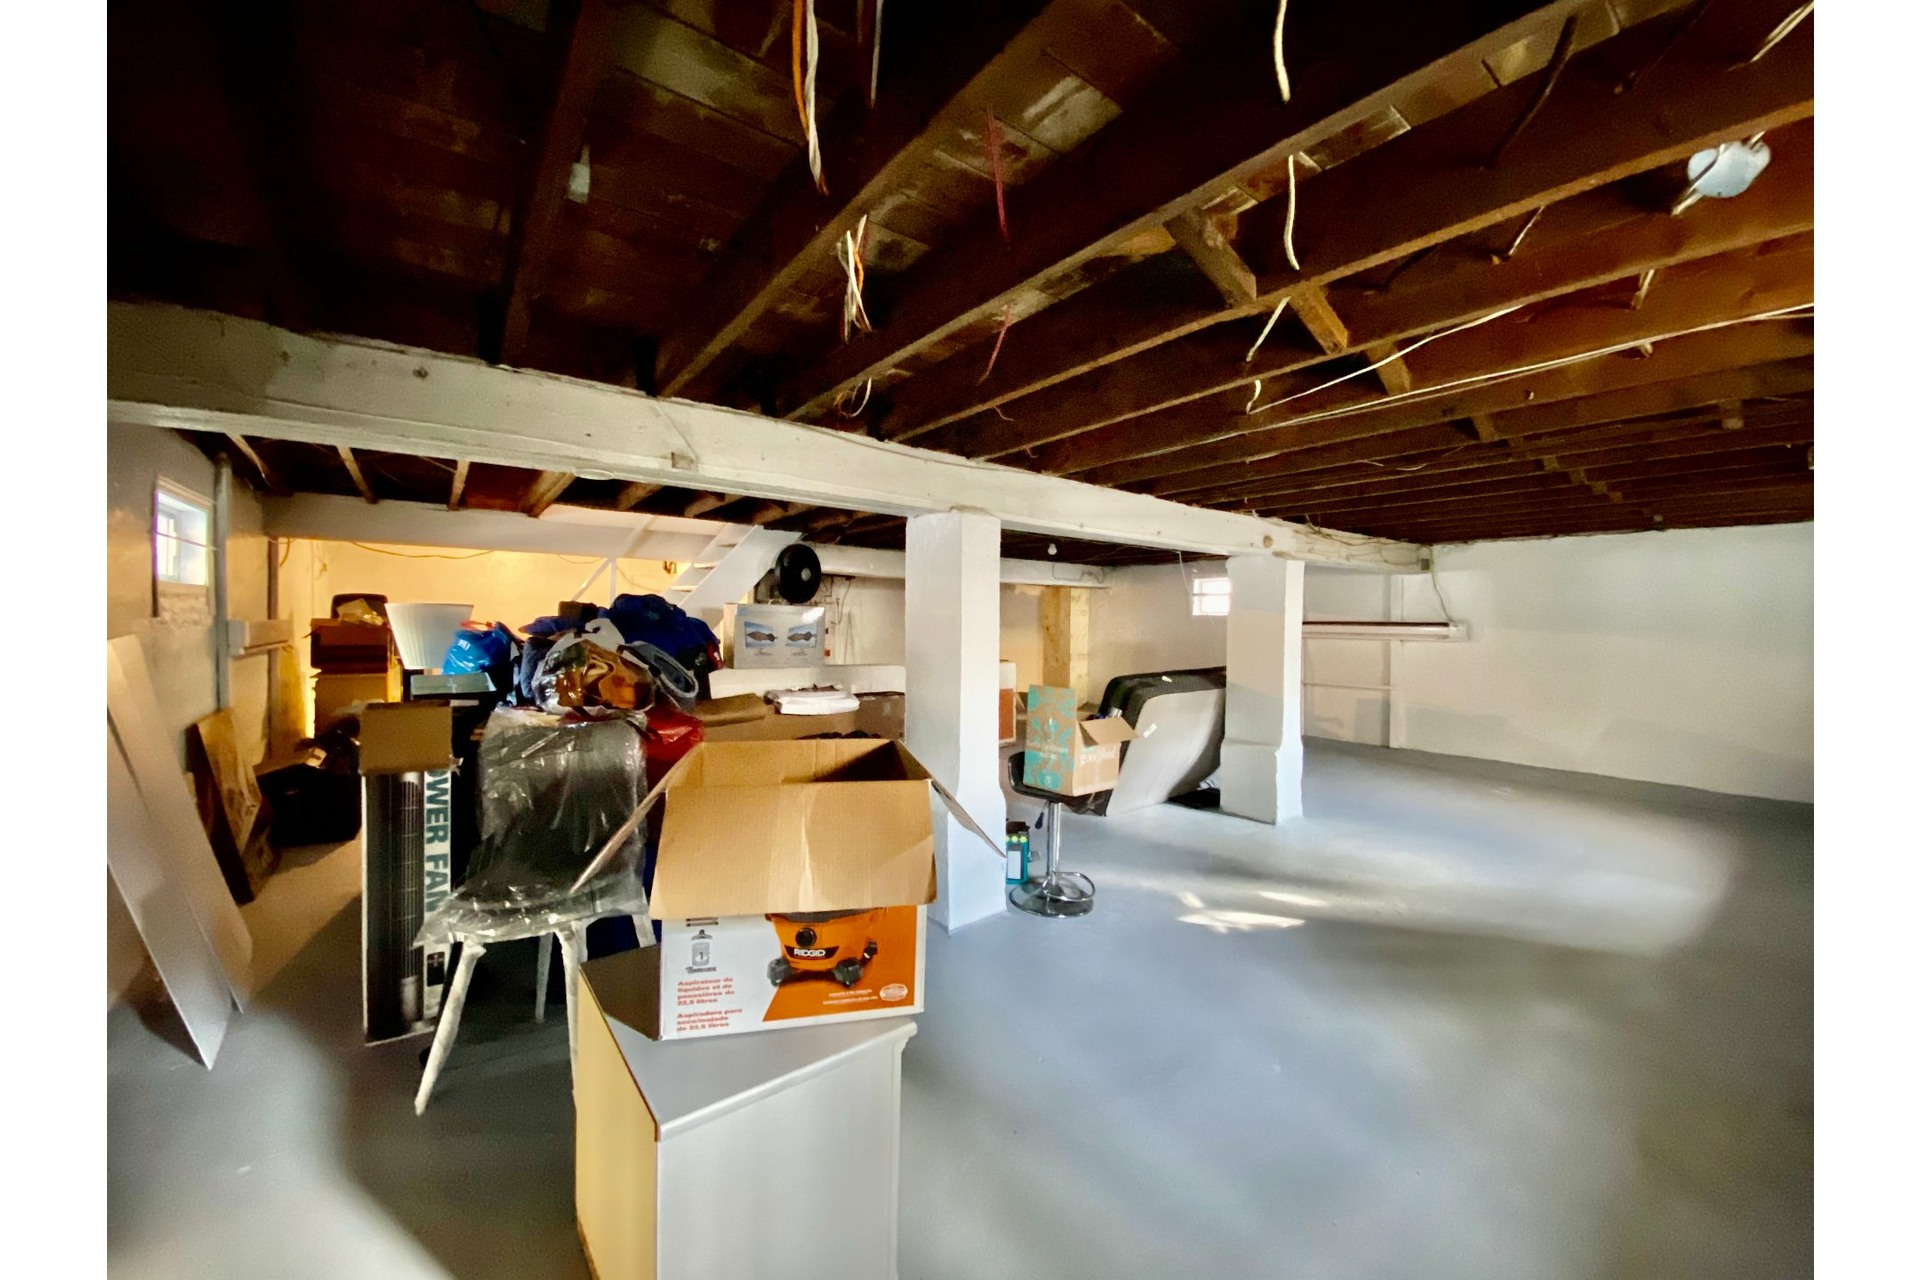 image 24 - Duplex En venta Lachine Montréal  - 6 habitaciones